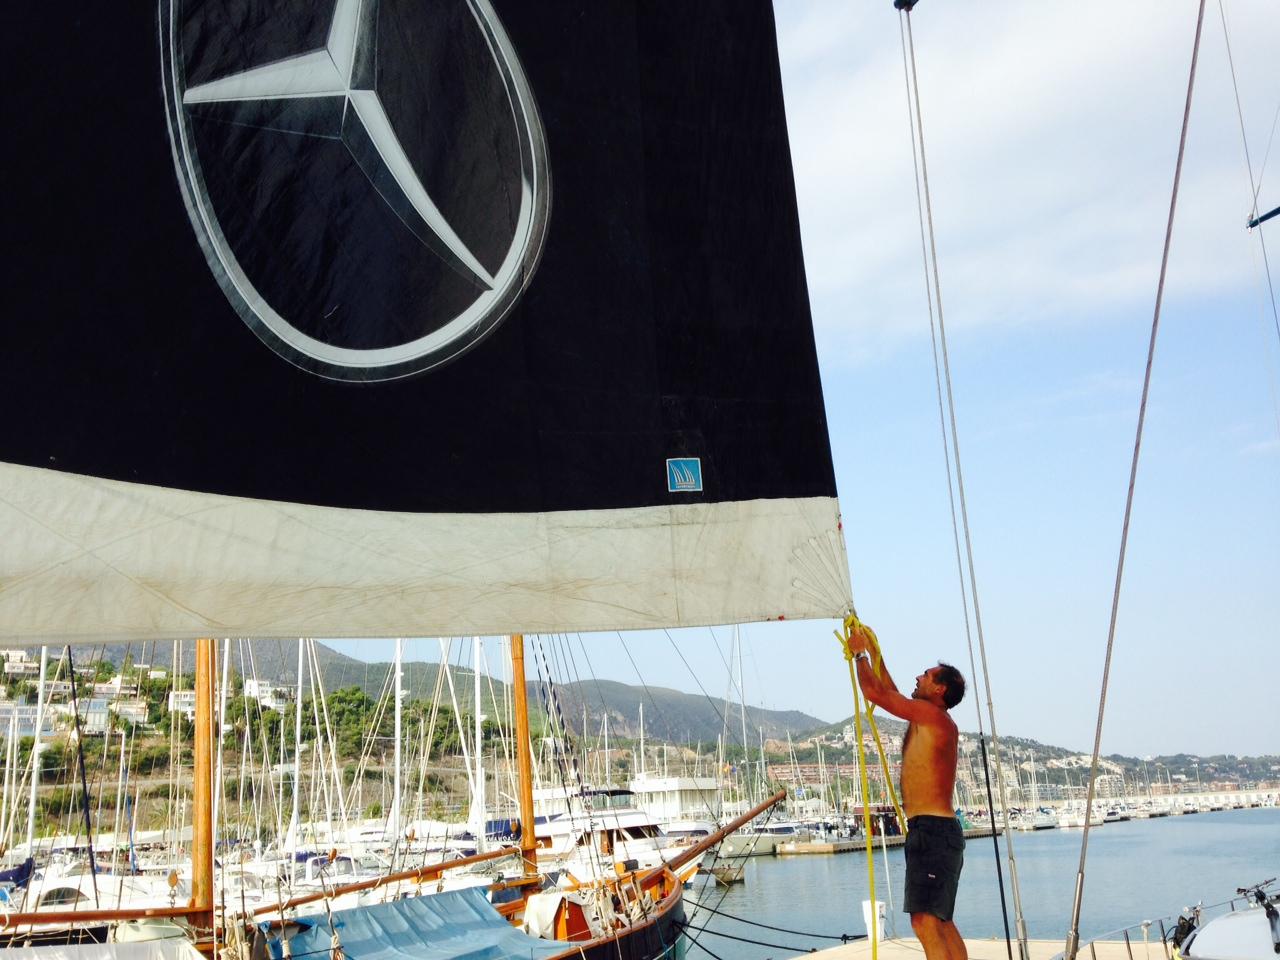 Mike controls Pangaea's sails in Barcelona